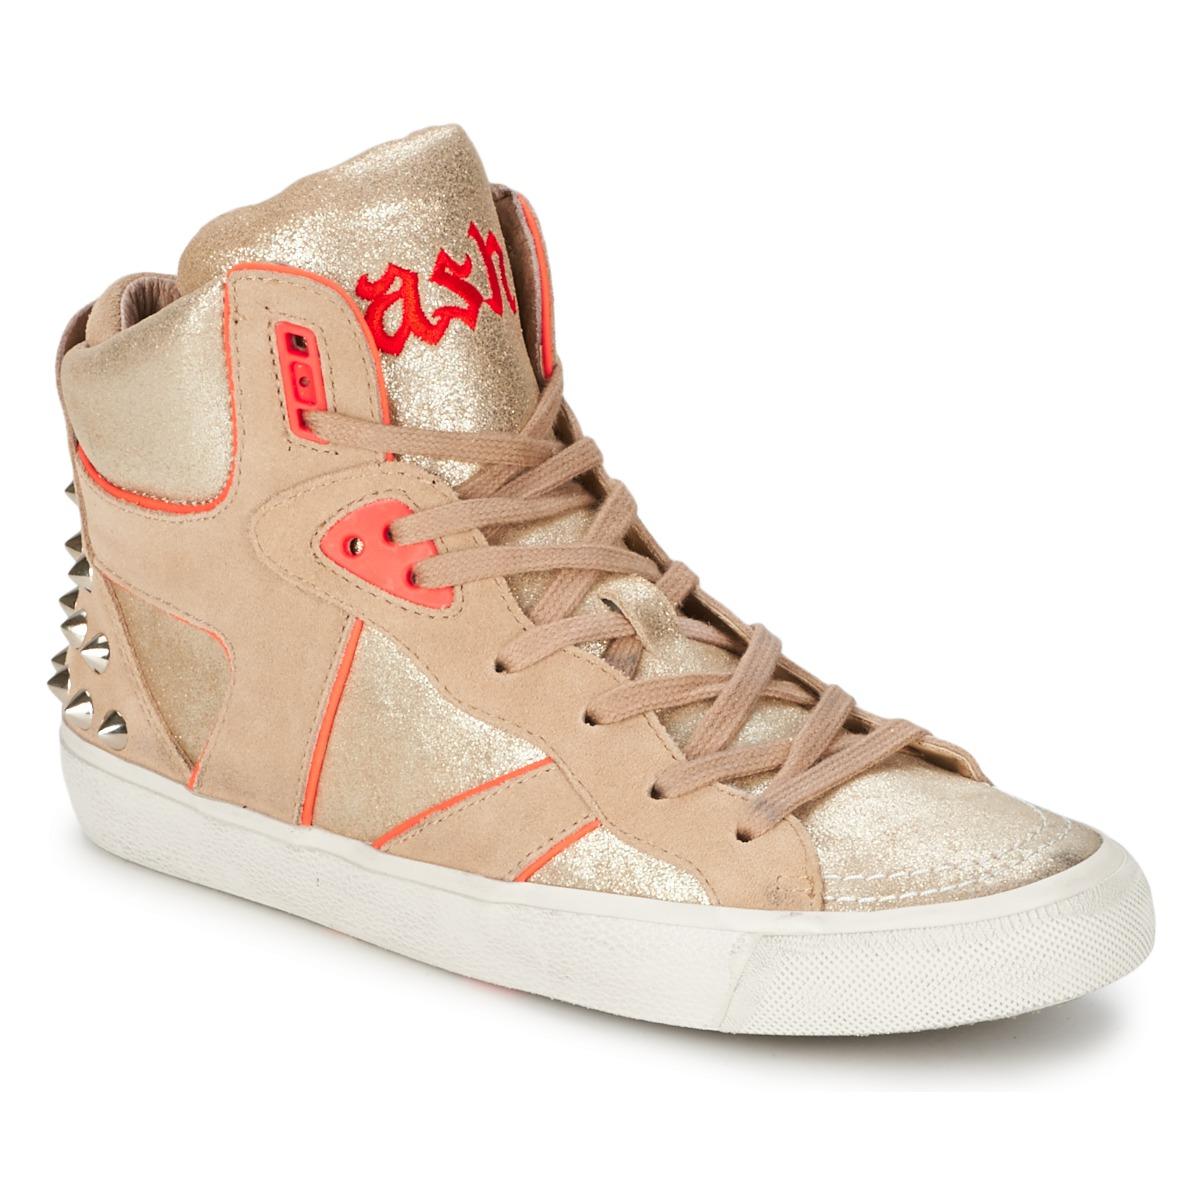 Ash SPIRIT Beige / Rose - Kostenloser Versand bei Spartoode ! - Schuhe Sneaker High Damen 99,50 €